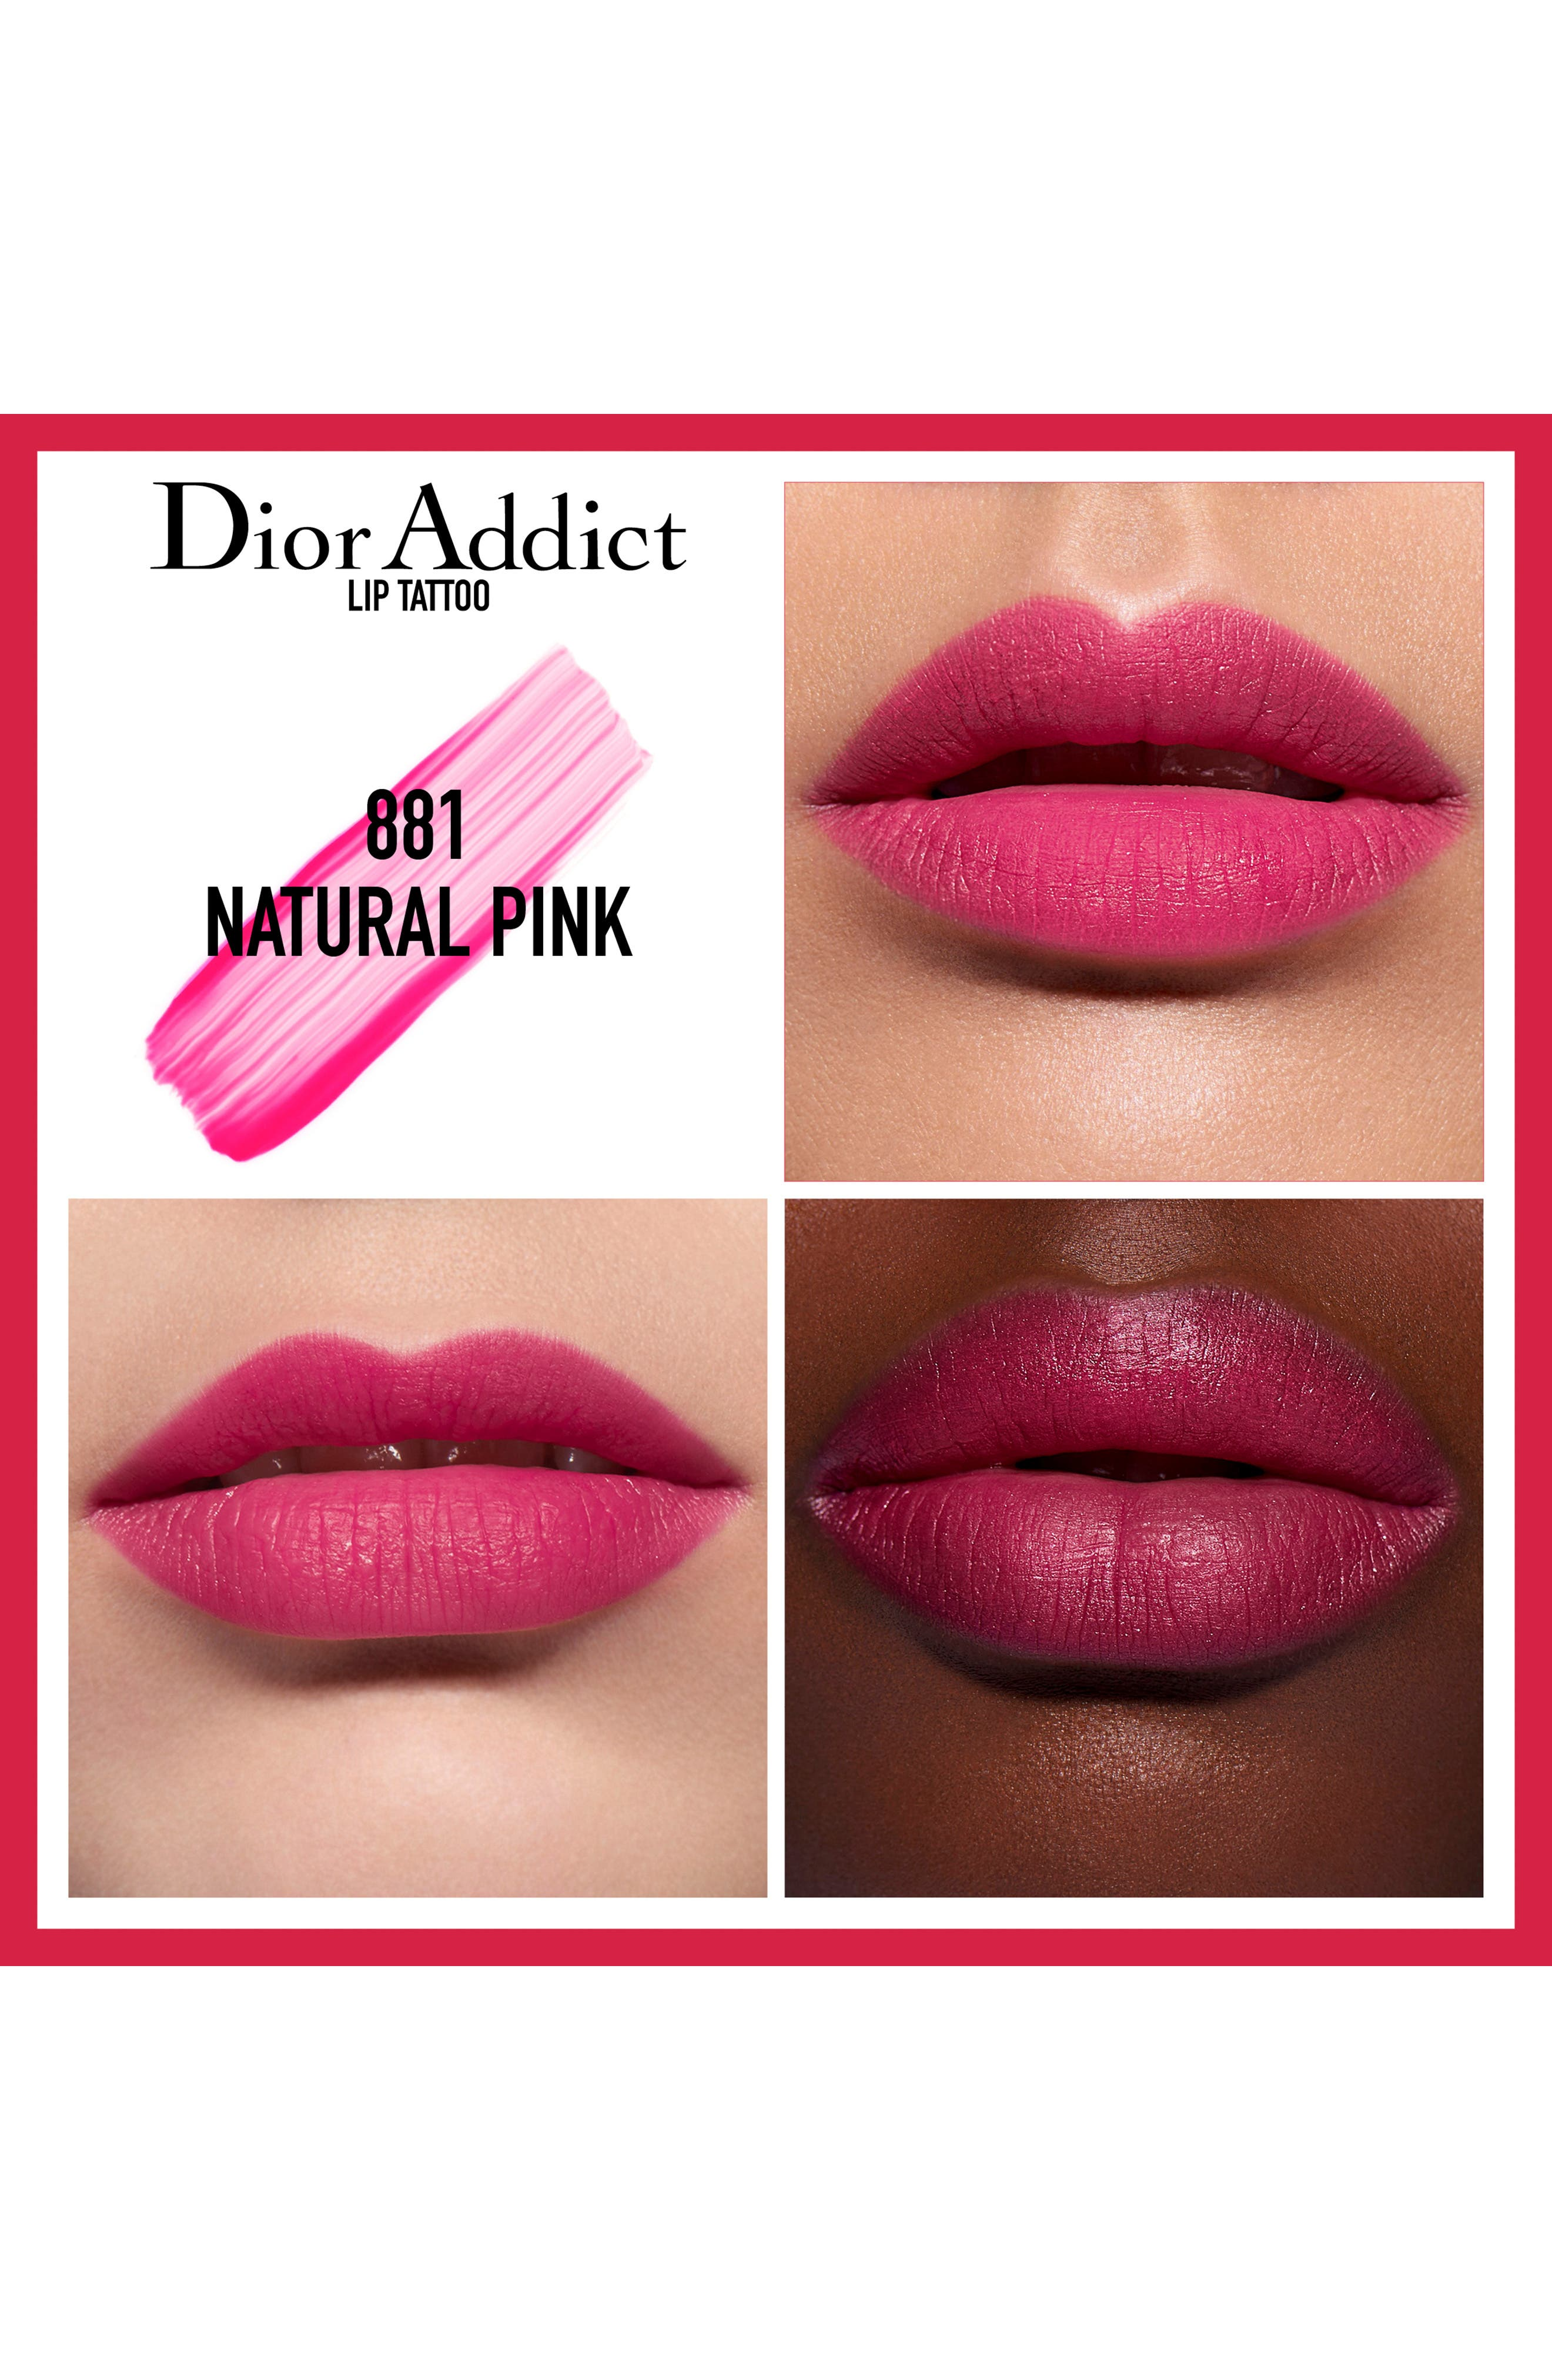 DIOR,                             Addict Lip Tattoo Long-Wearing Color Tint,                             Alternate thumbnail 2, color,                             881 NATURAL PINK